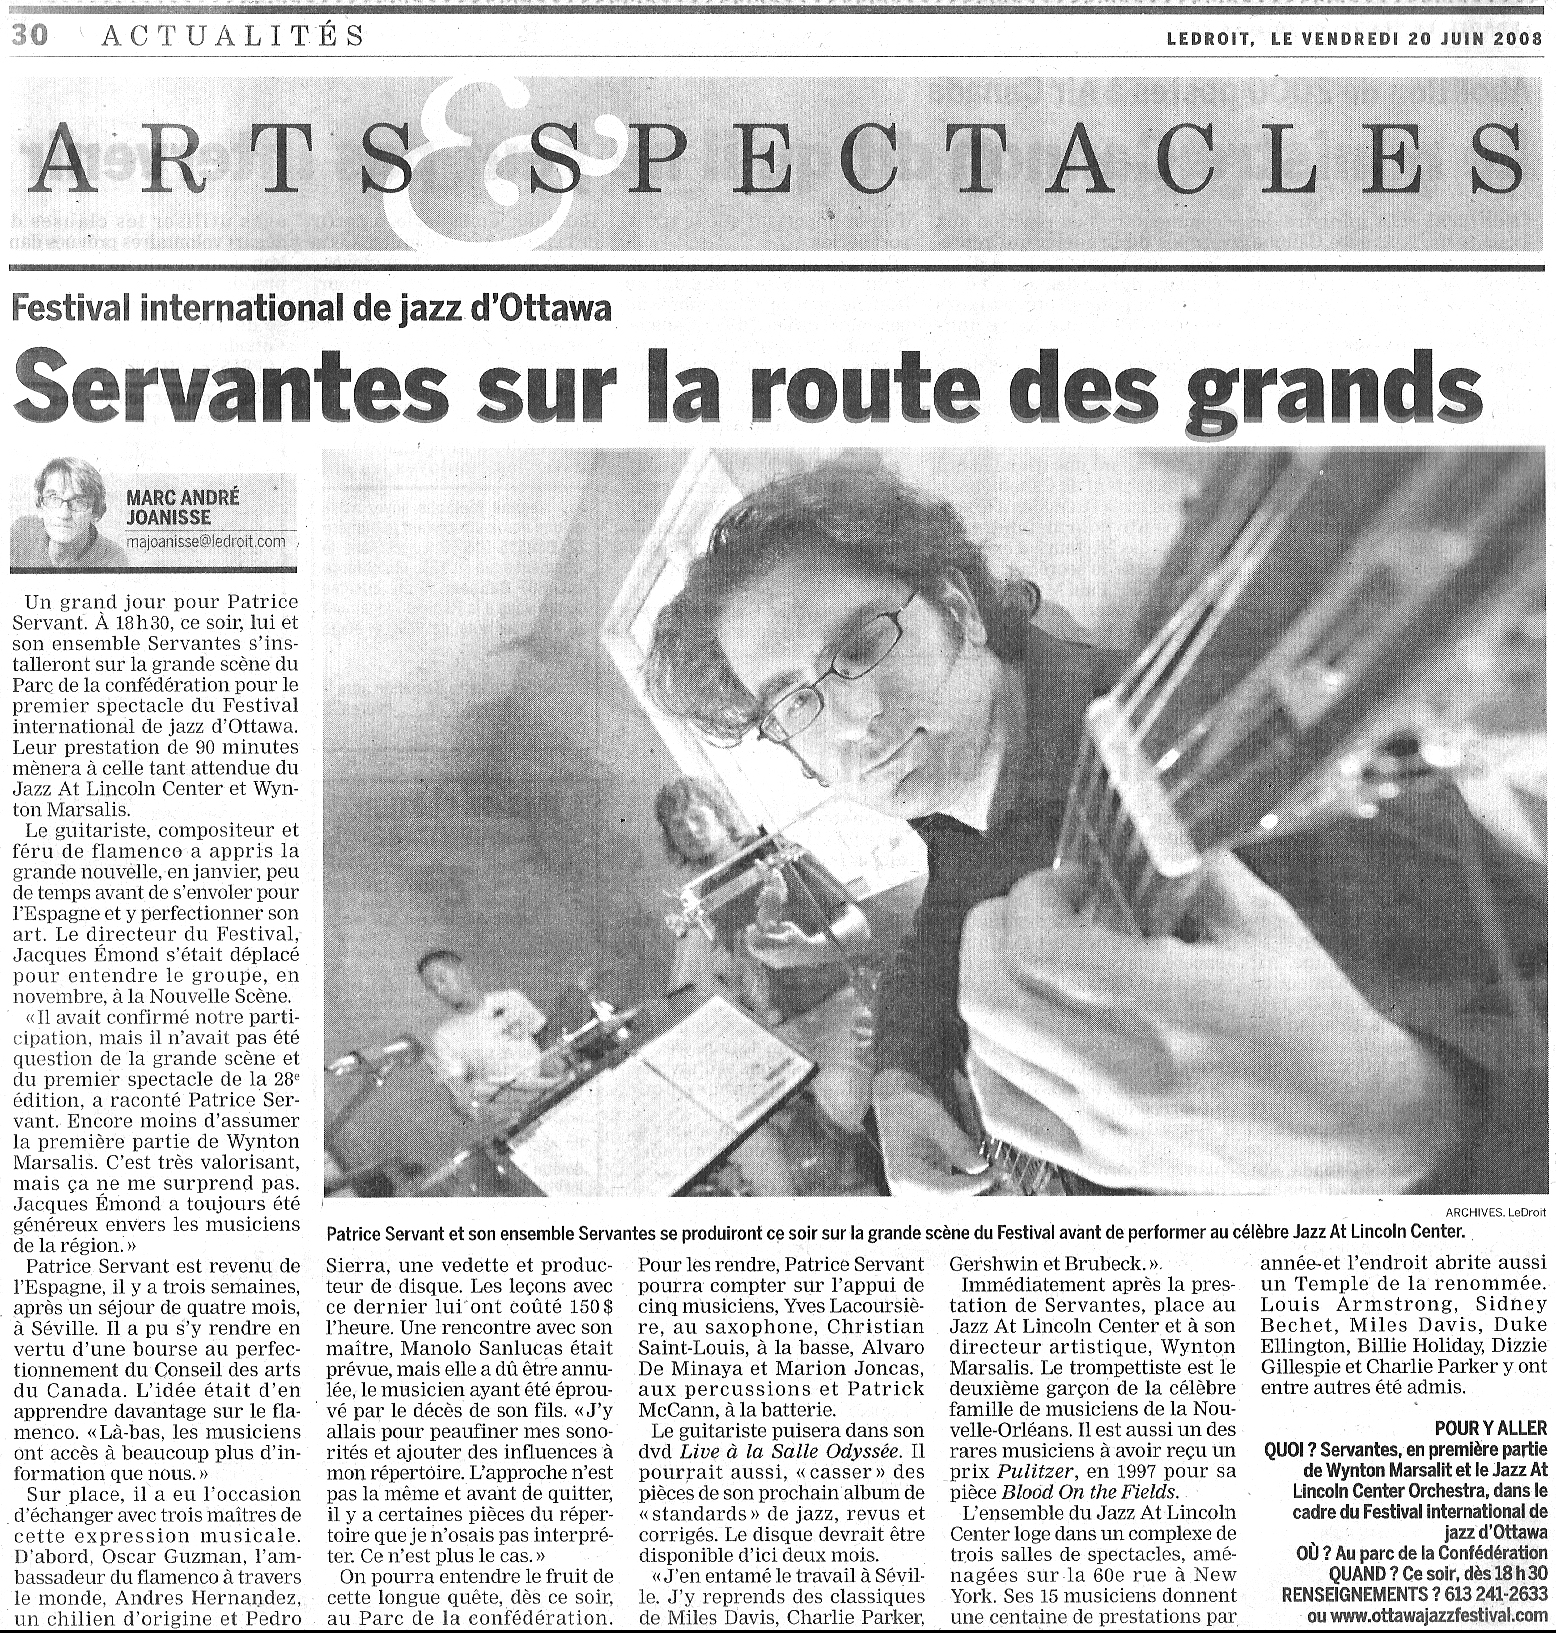 LeDroit, 2008